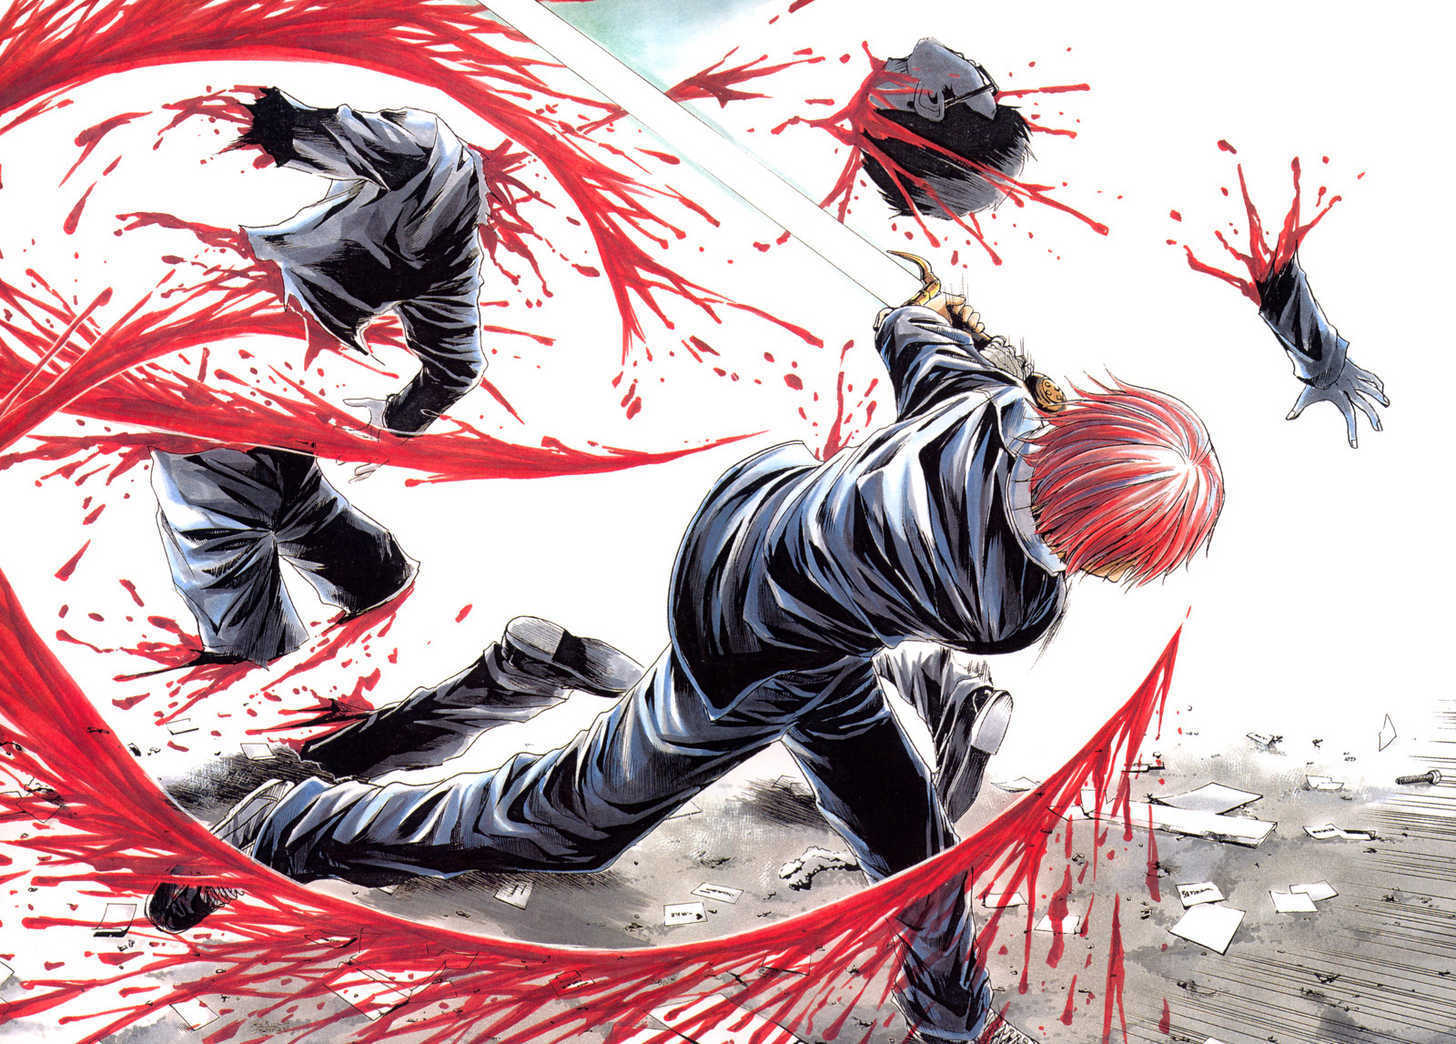 Epic Anime Wallpaper: Epic Anime Wallpapers (69 Wallpapers)